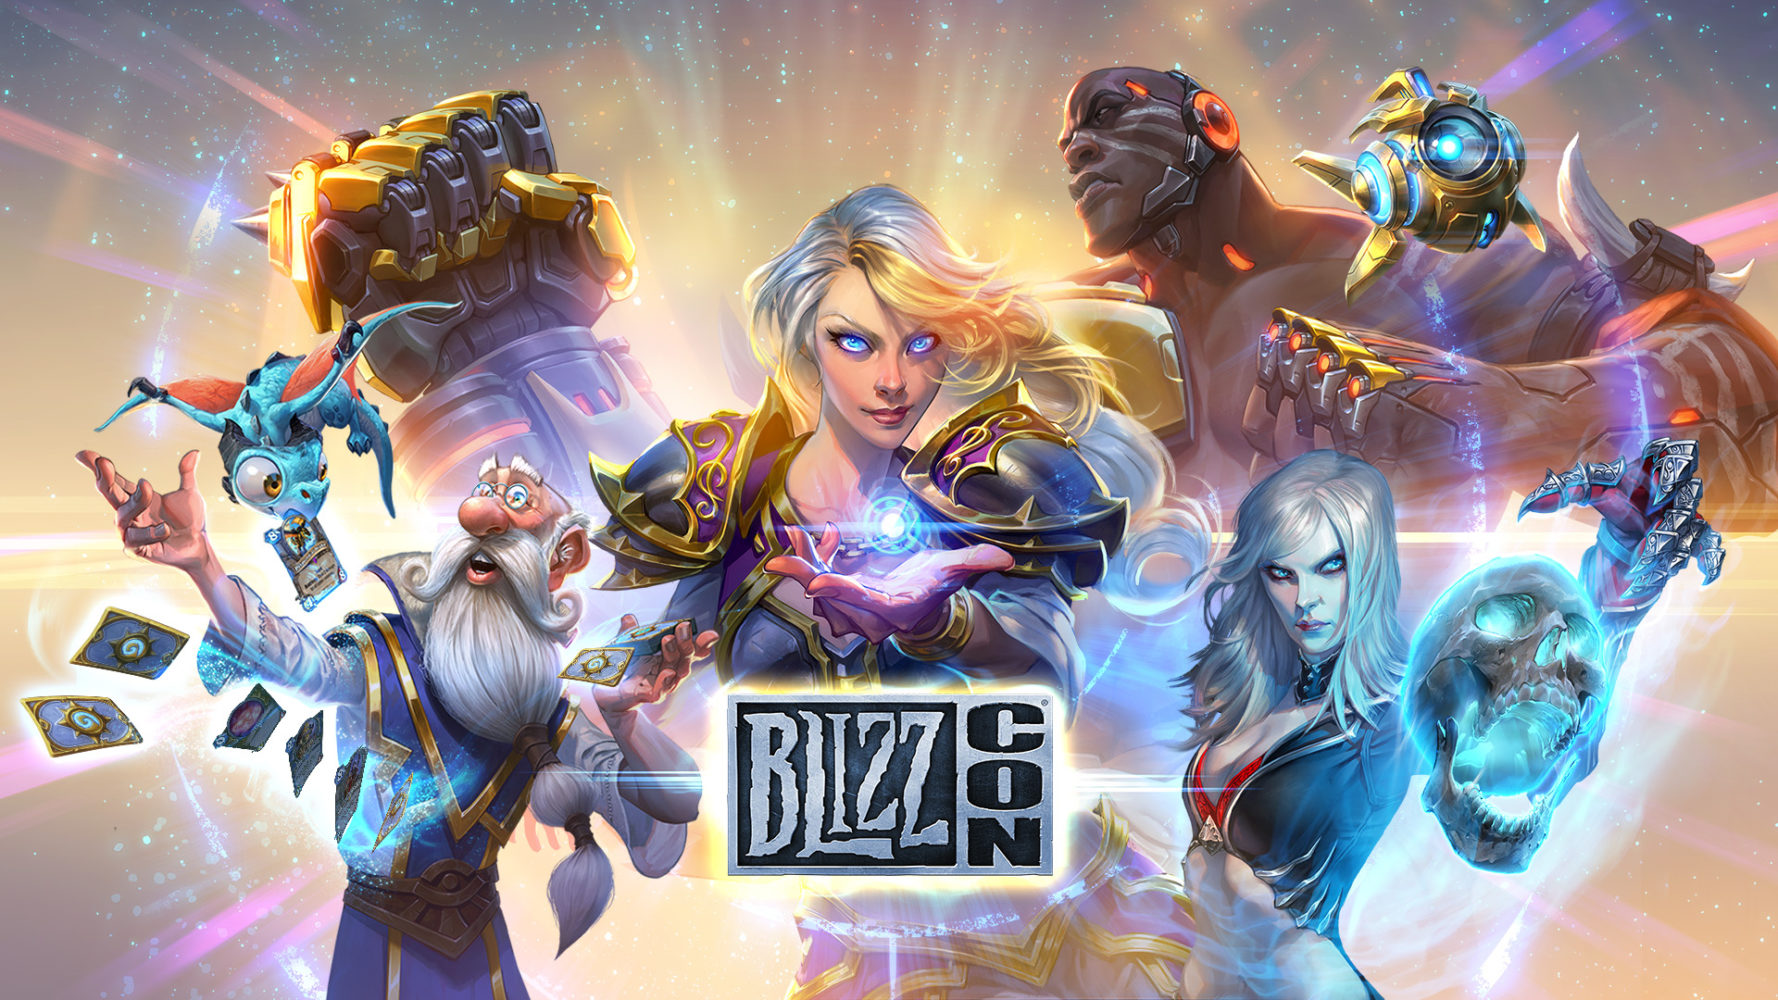 BlizzCon 2017 Blizzard